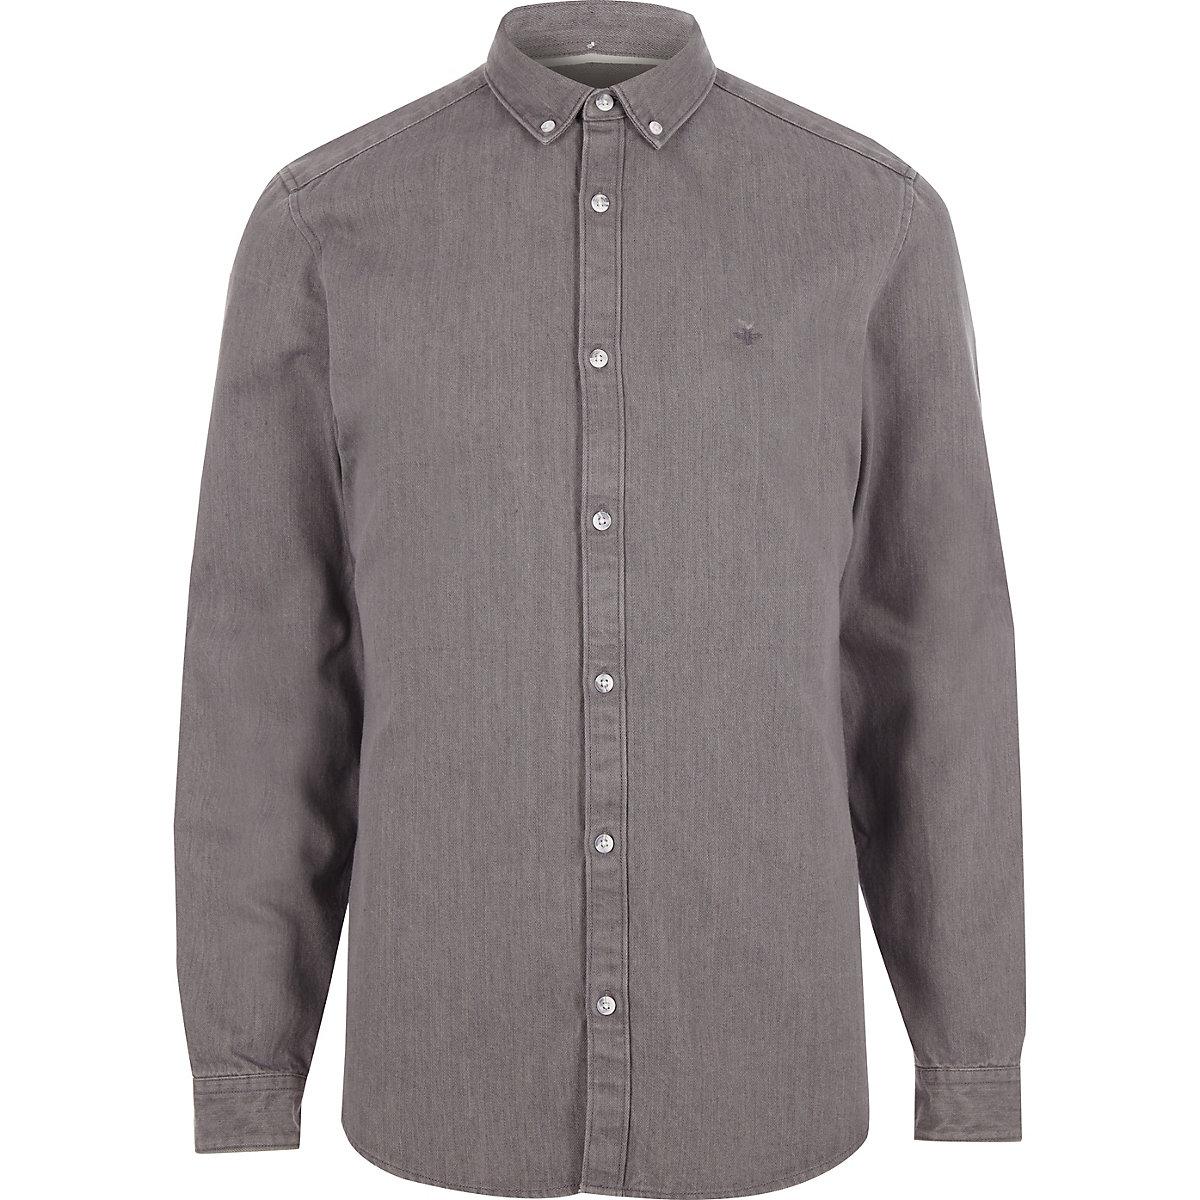 Grey long sleeve denim shirt